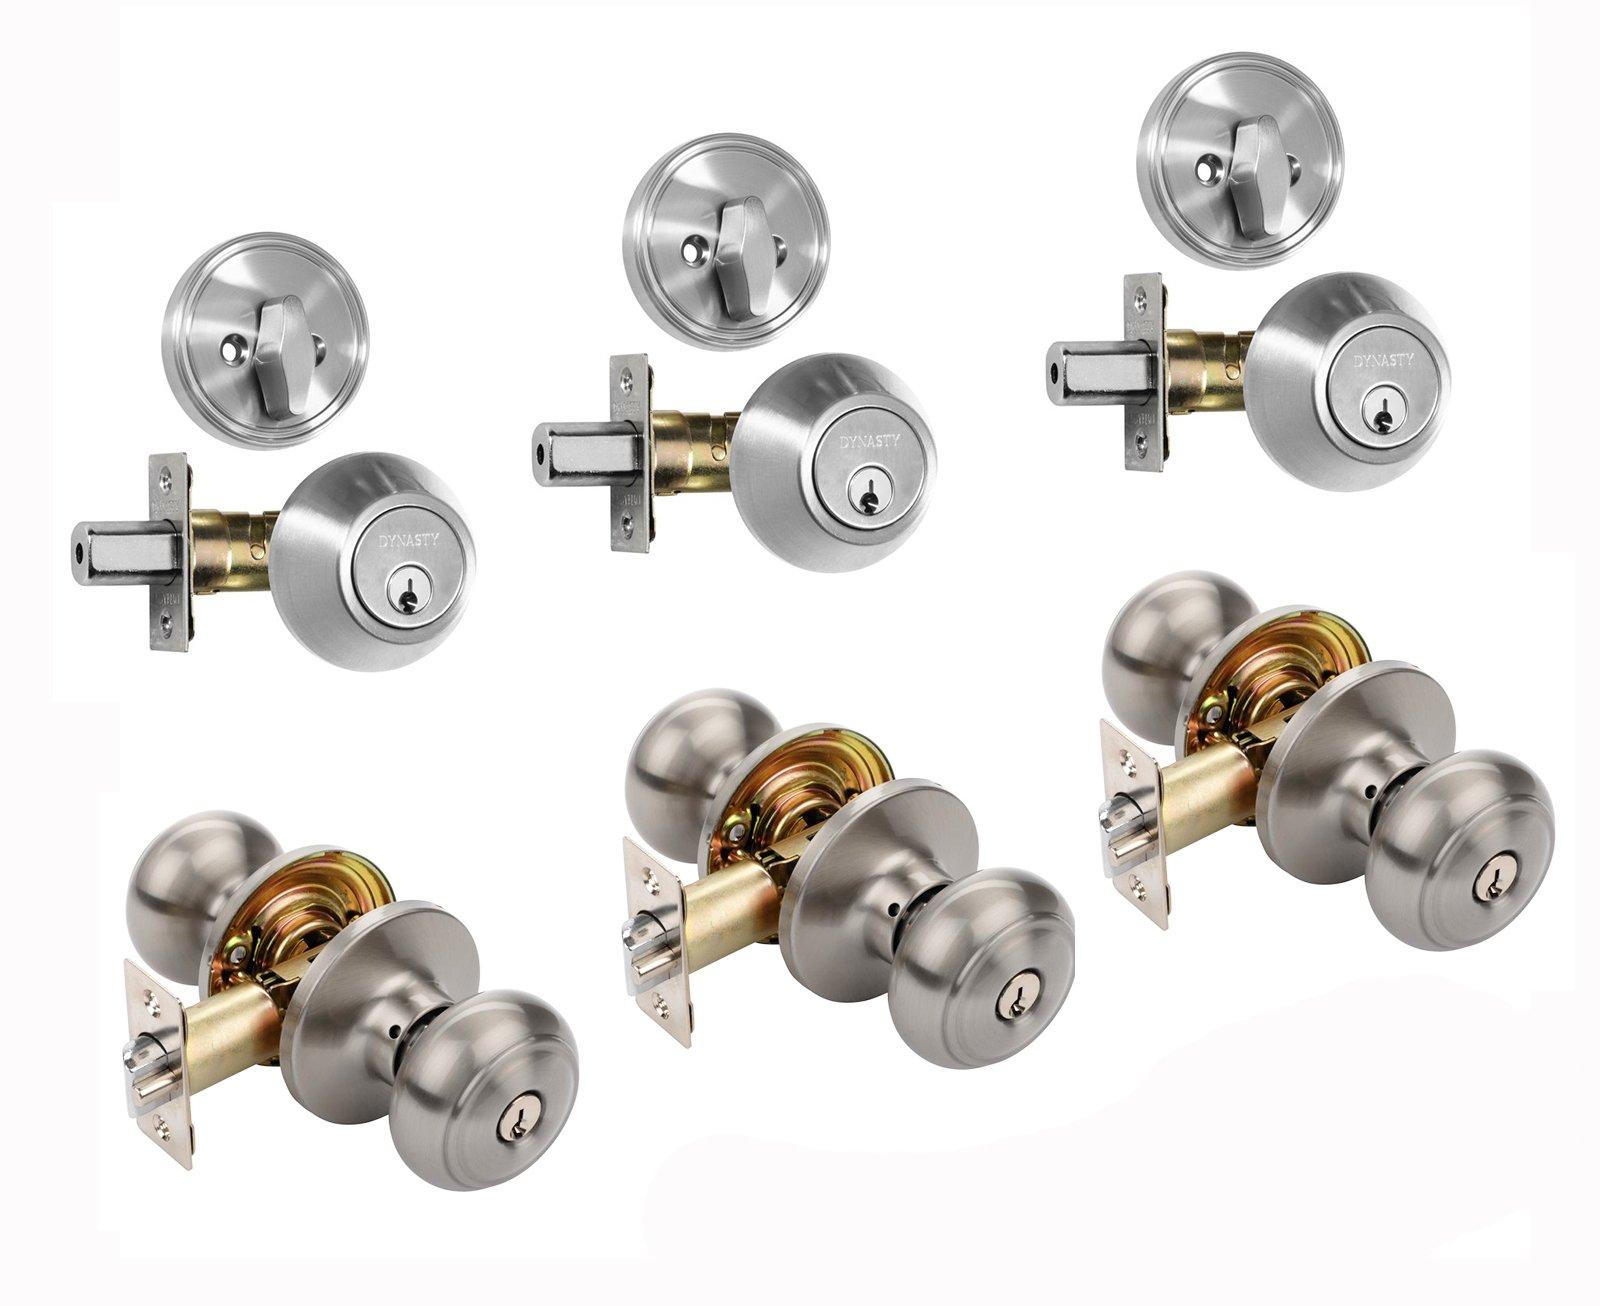 Dynasty Hardware CP-SIE-US15, Sierra Entry Door Knob Lockset and Single Cylinder Deadbolt Combination Set, Satin Nickel (3 Pack) Keyed Alike